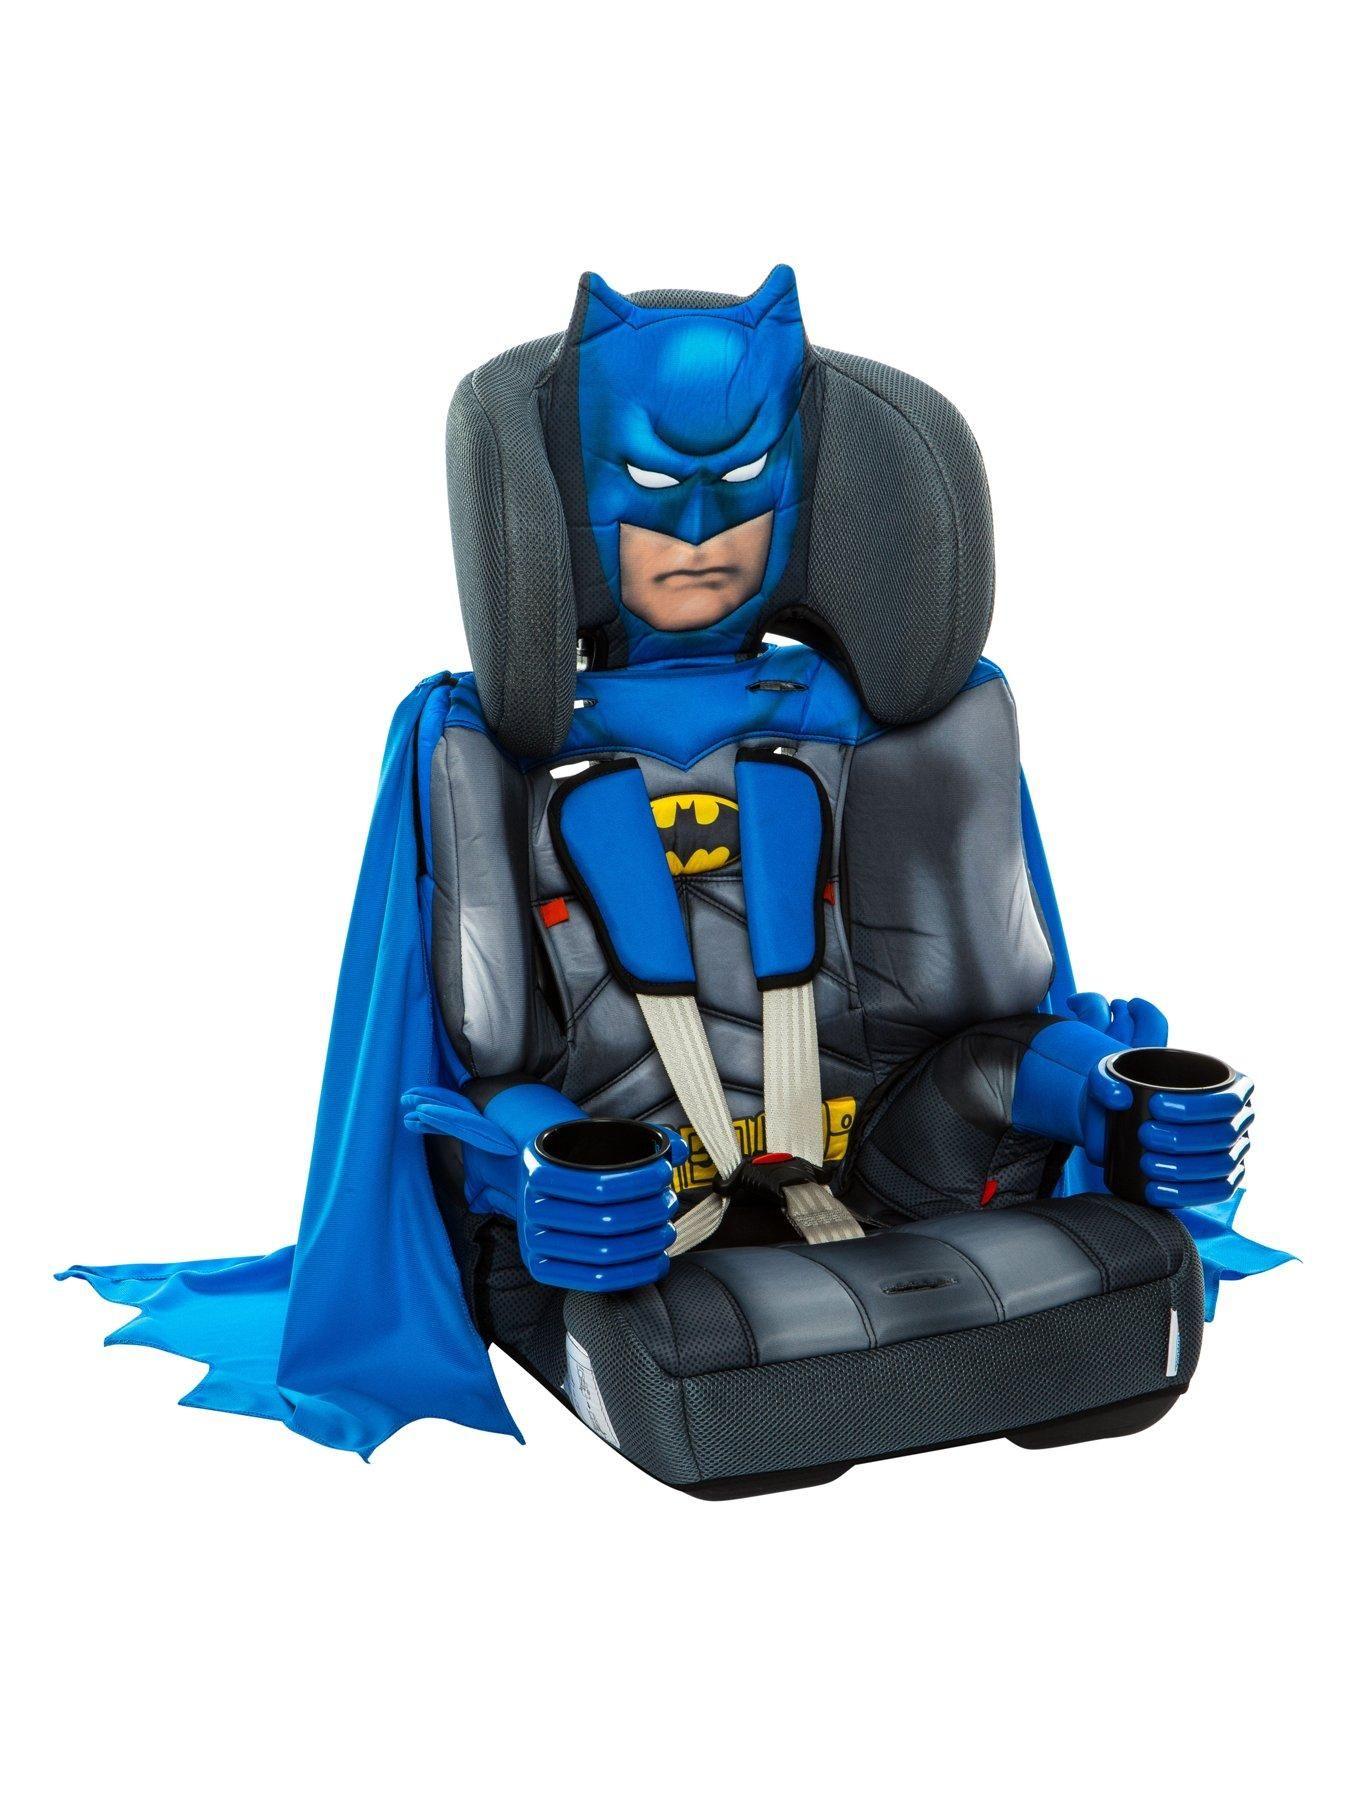 Kids Embrace Batman Group 1, 2, 3 Car Seat Car seats